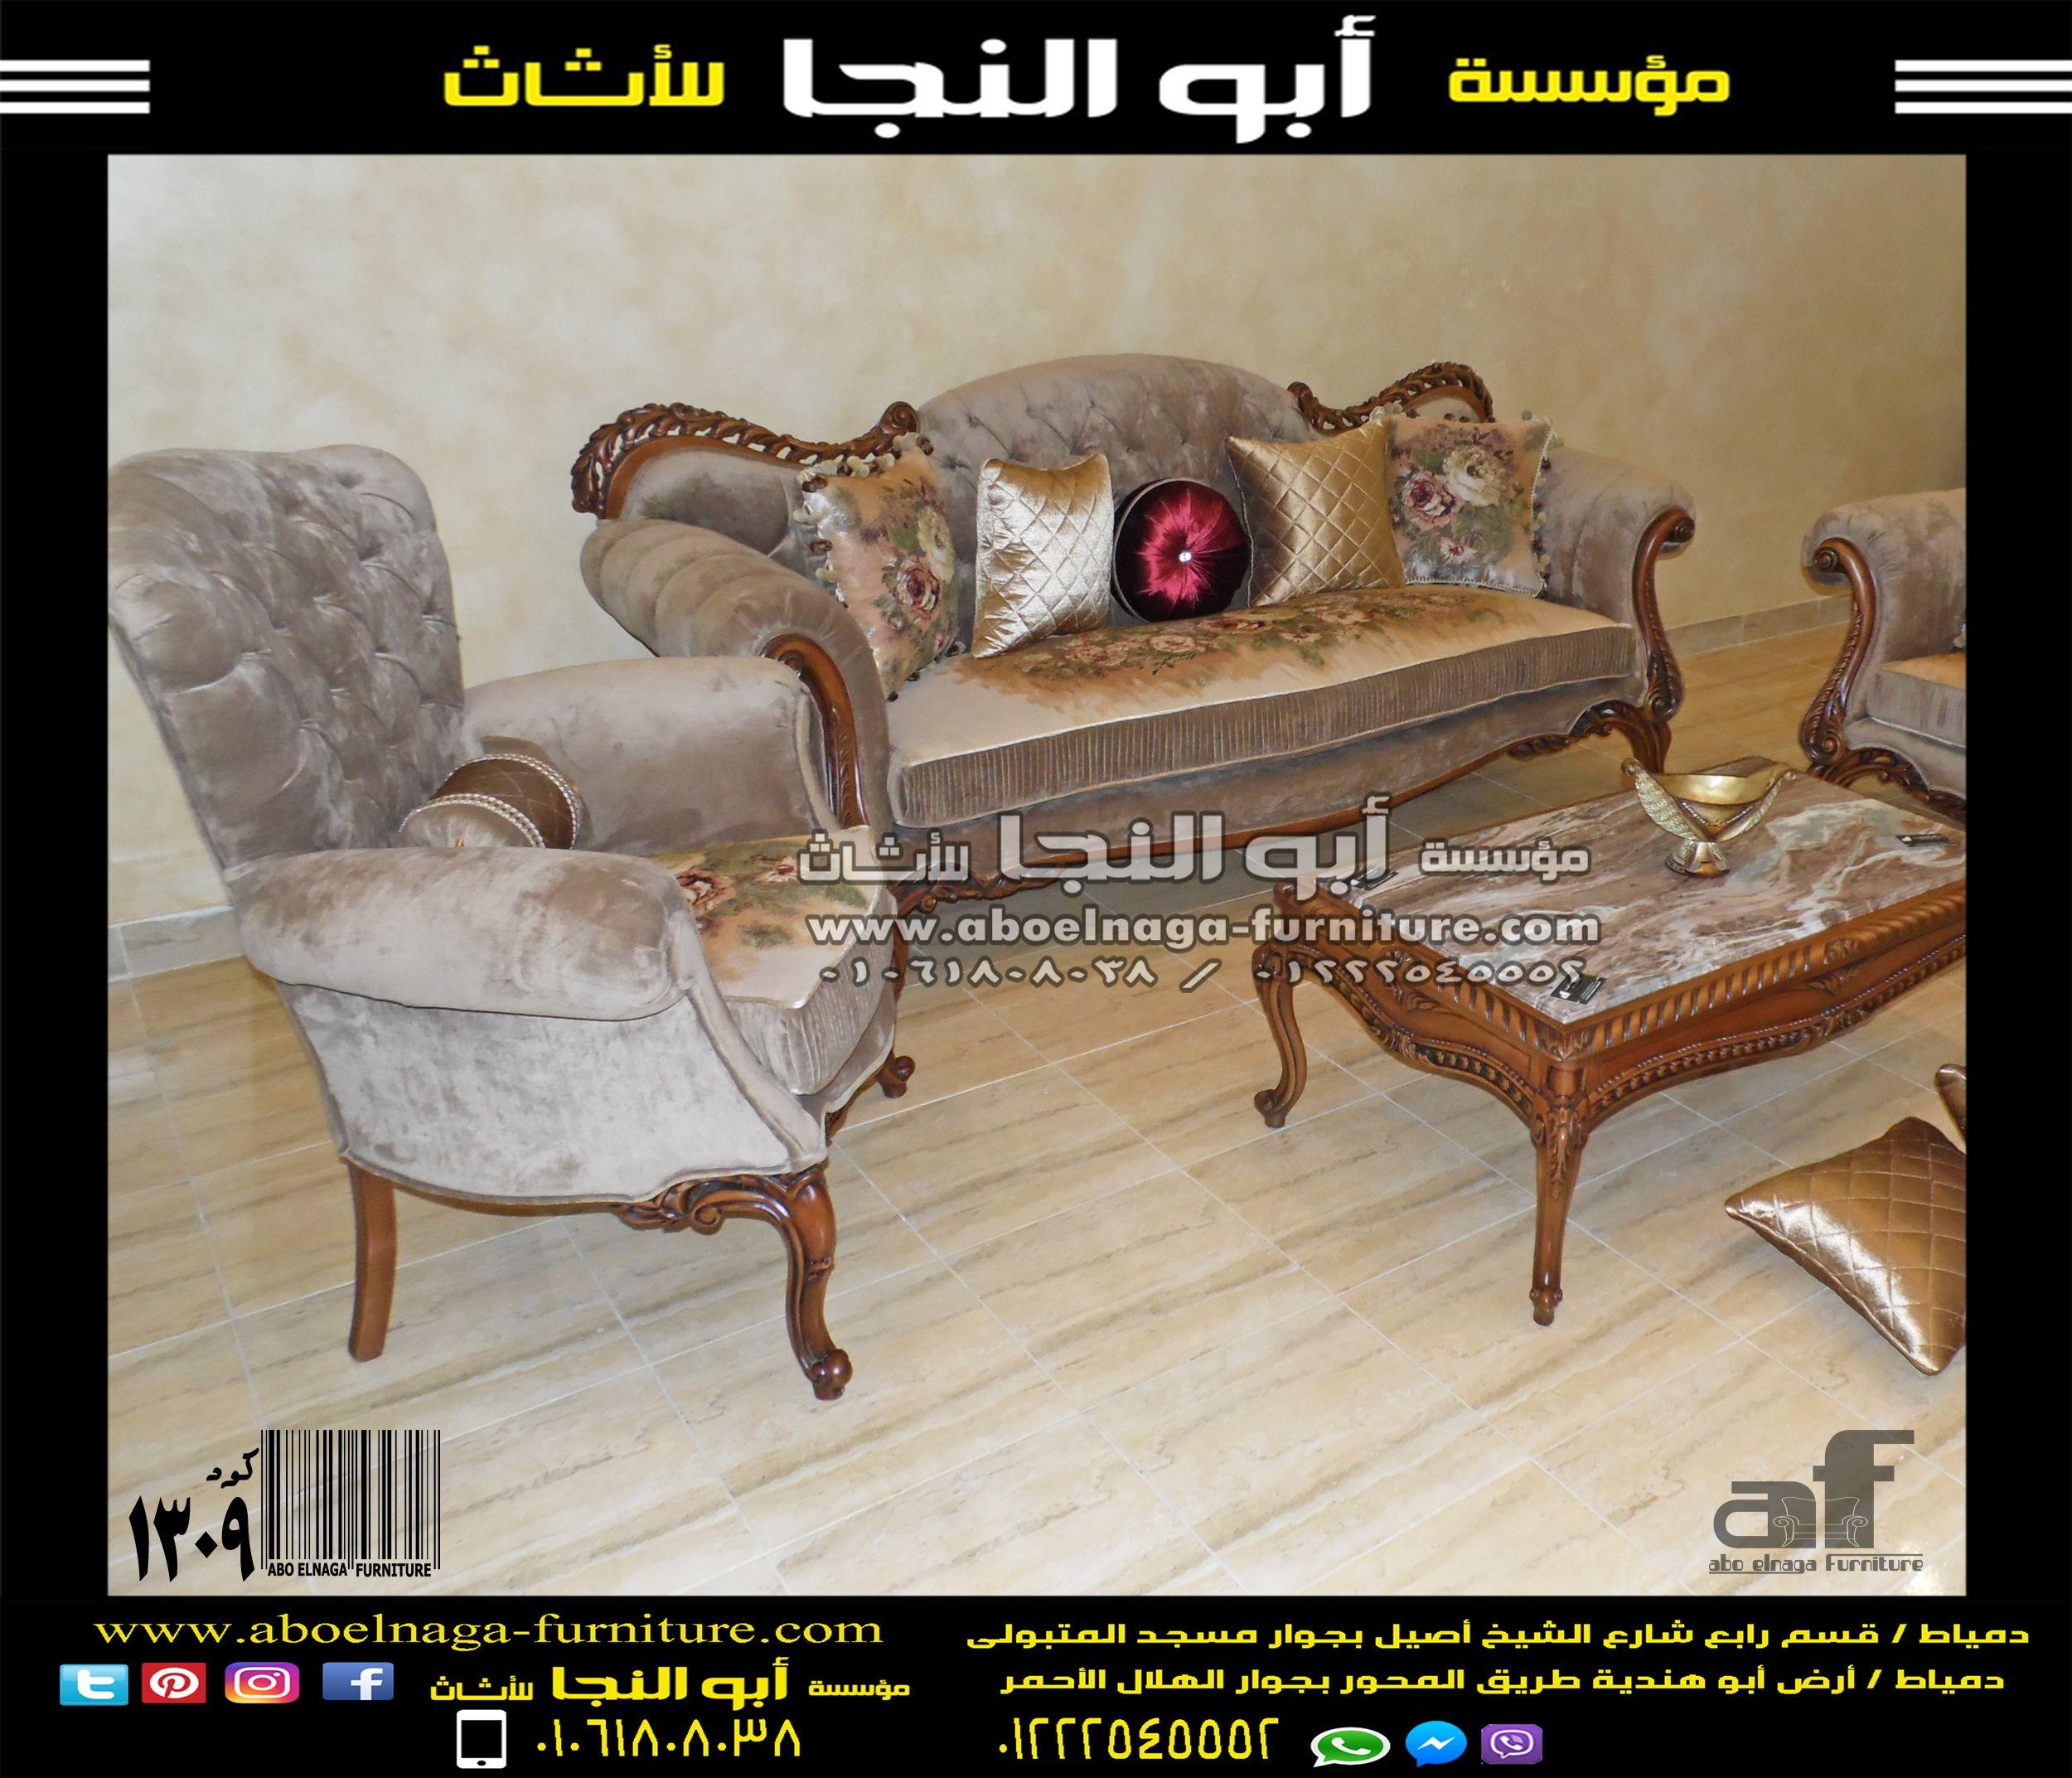 كود 1309 Outdoor Decor Home Decor Outdoor Furniture